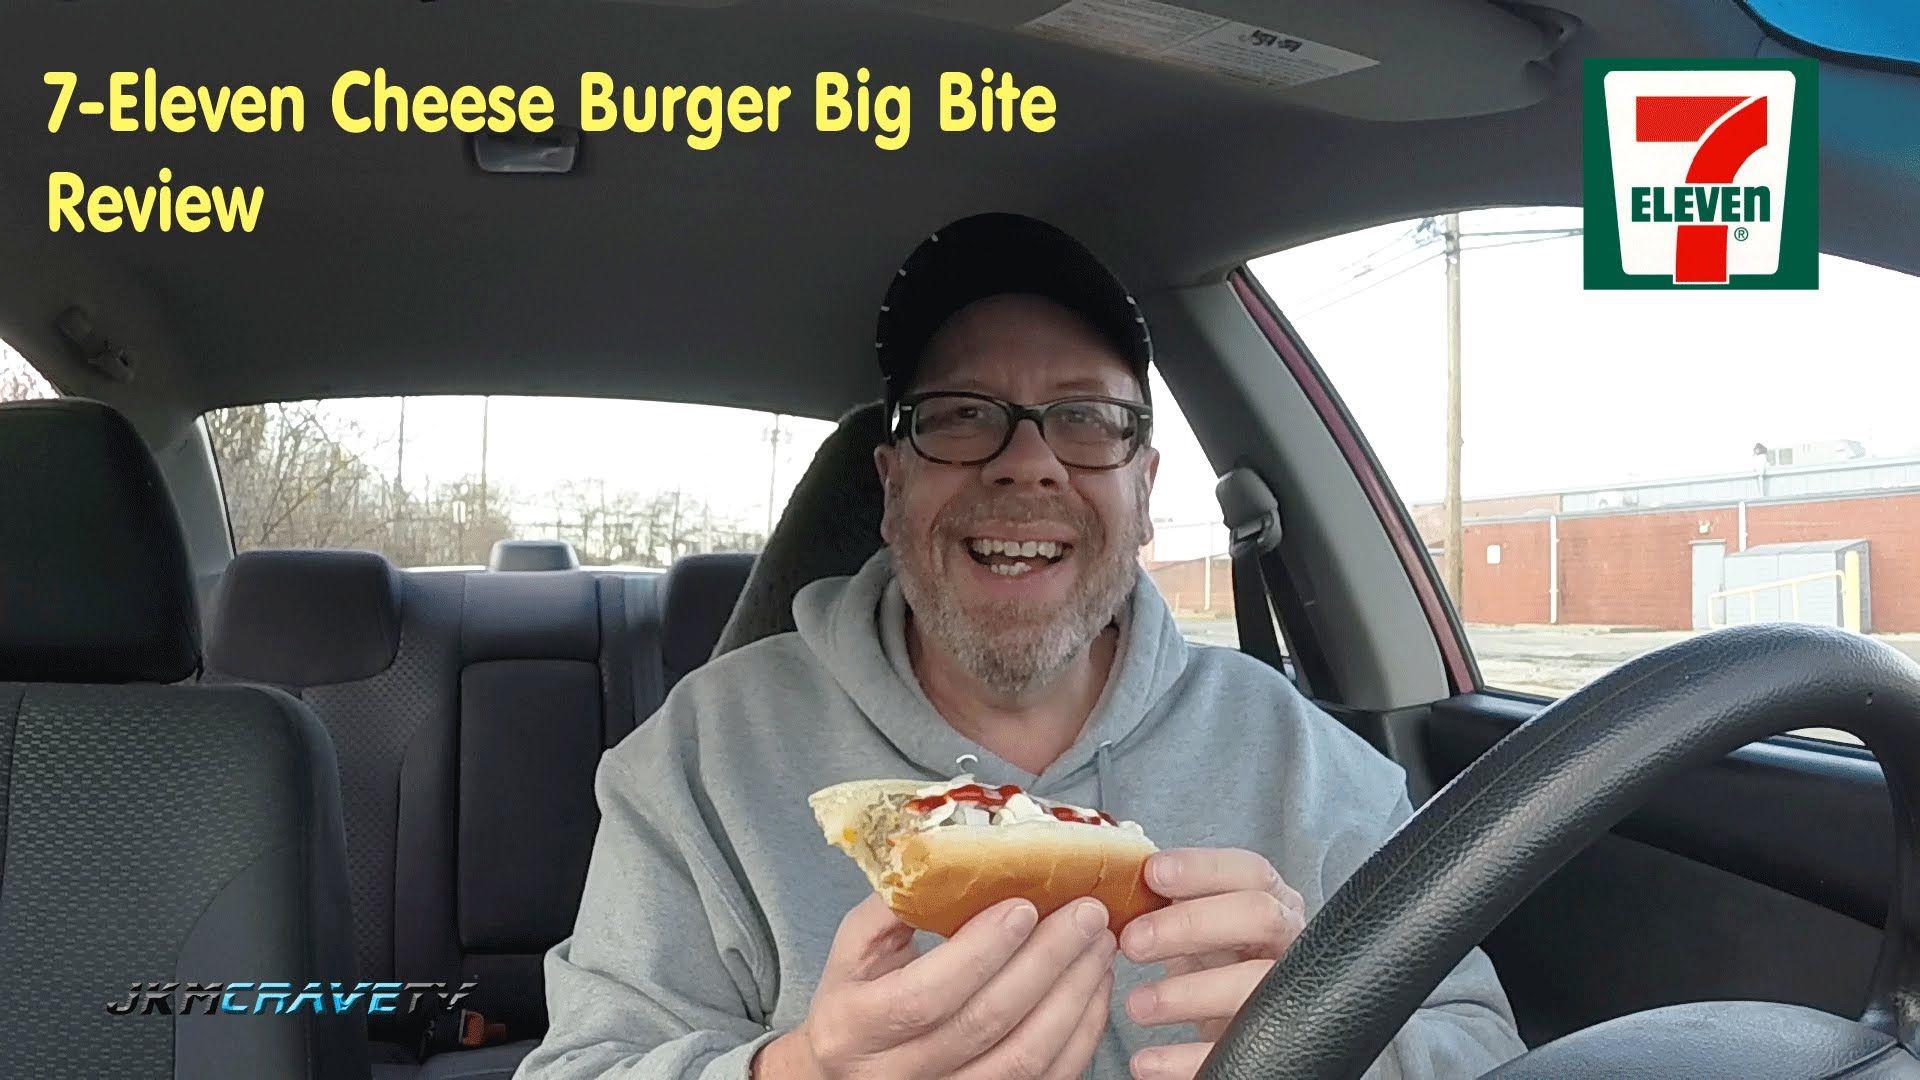 Quick Bite Review 7 Eleven Cheeseburger Big Bite Fast Food